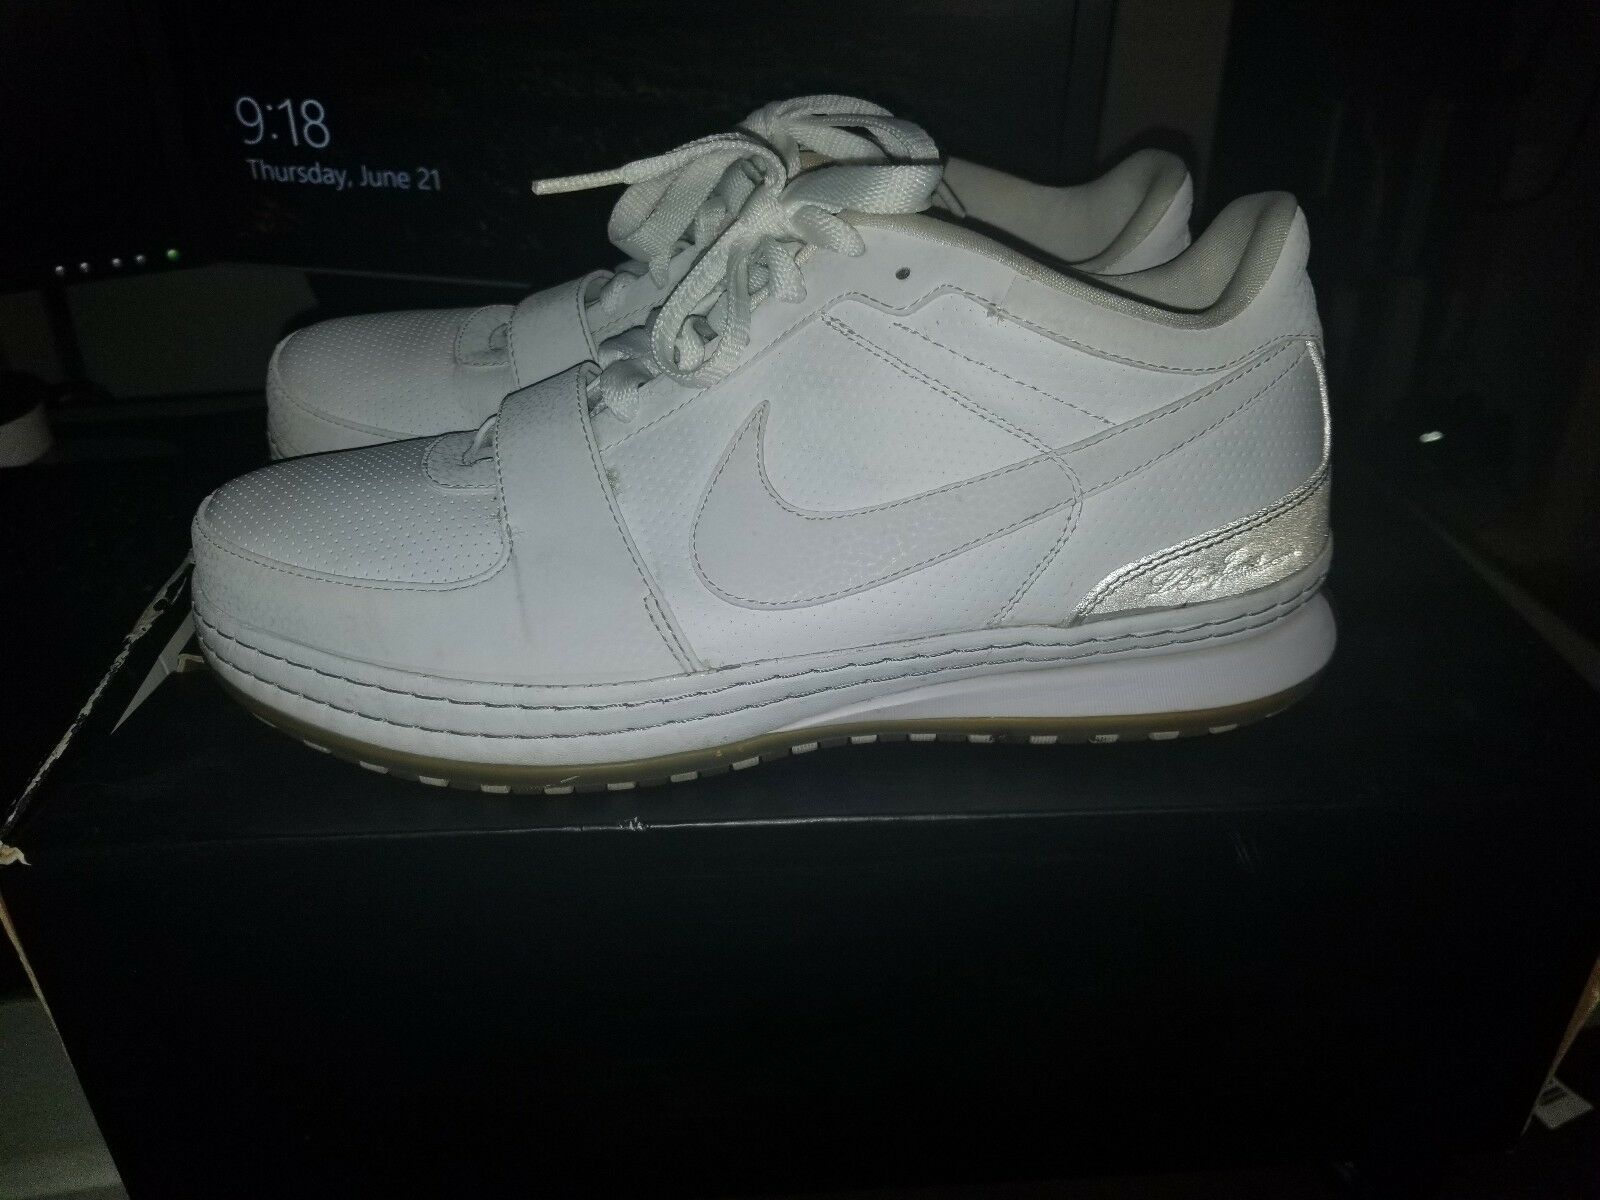 RARE Nike Zoom LeBron 6 VI Low White Medium Gray Gum Sz 10.5 354696-111 Retro LE The most popular shoes for men and women